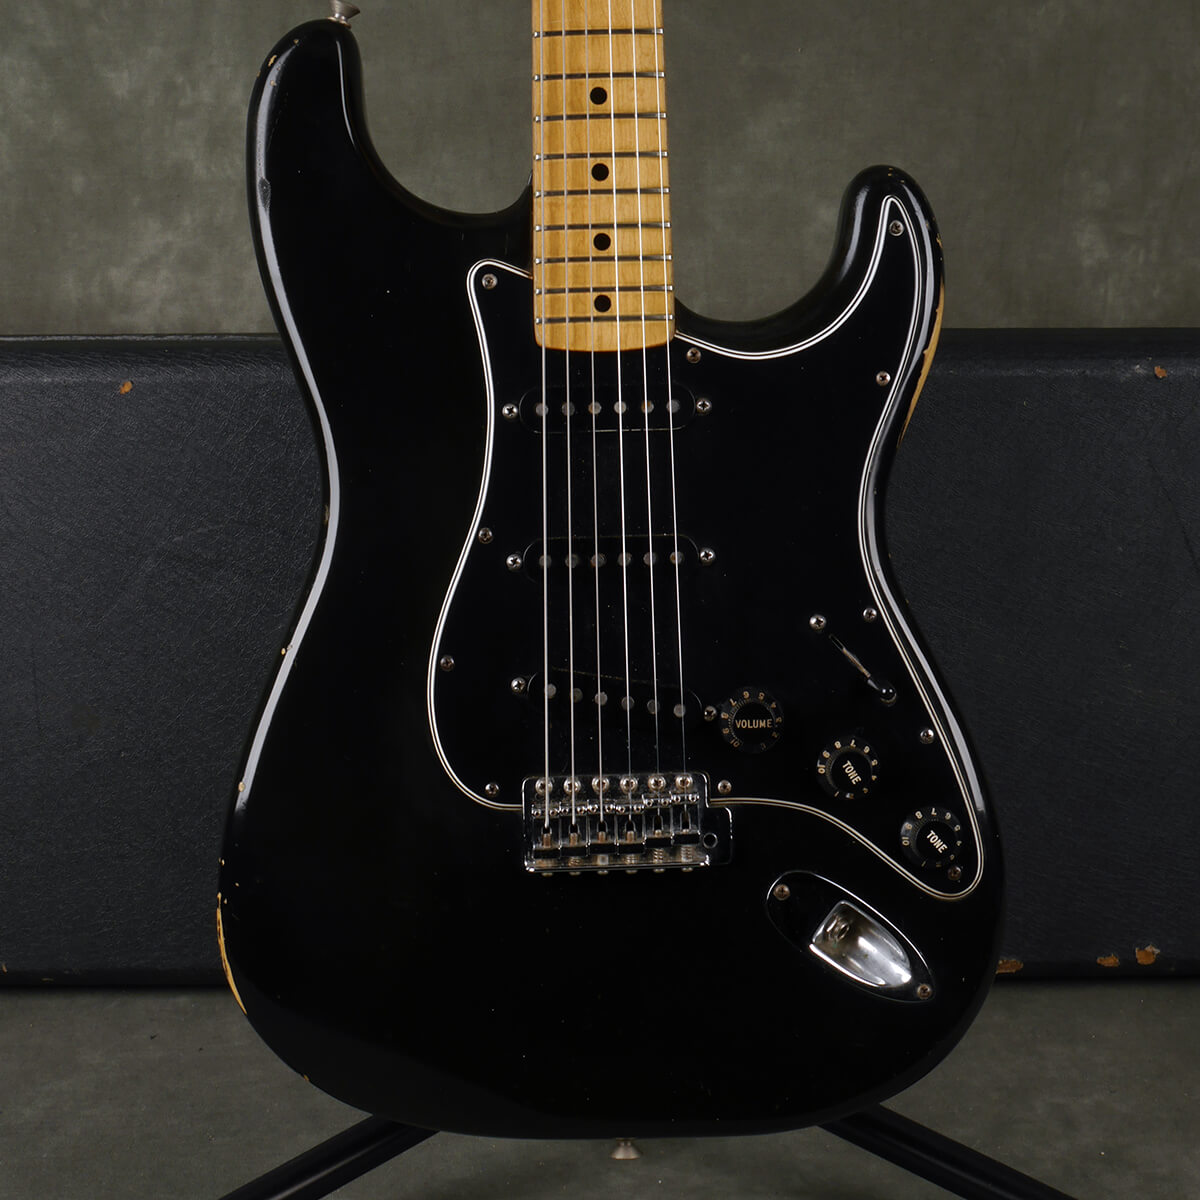 Fender 1977 Stratocaster - Black w/Hard Case - 2nd Hand